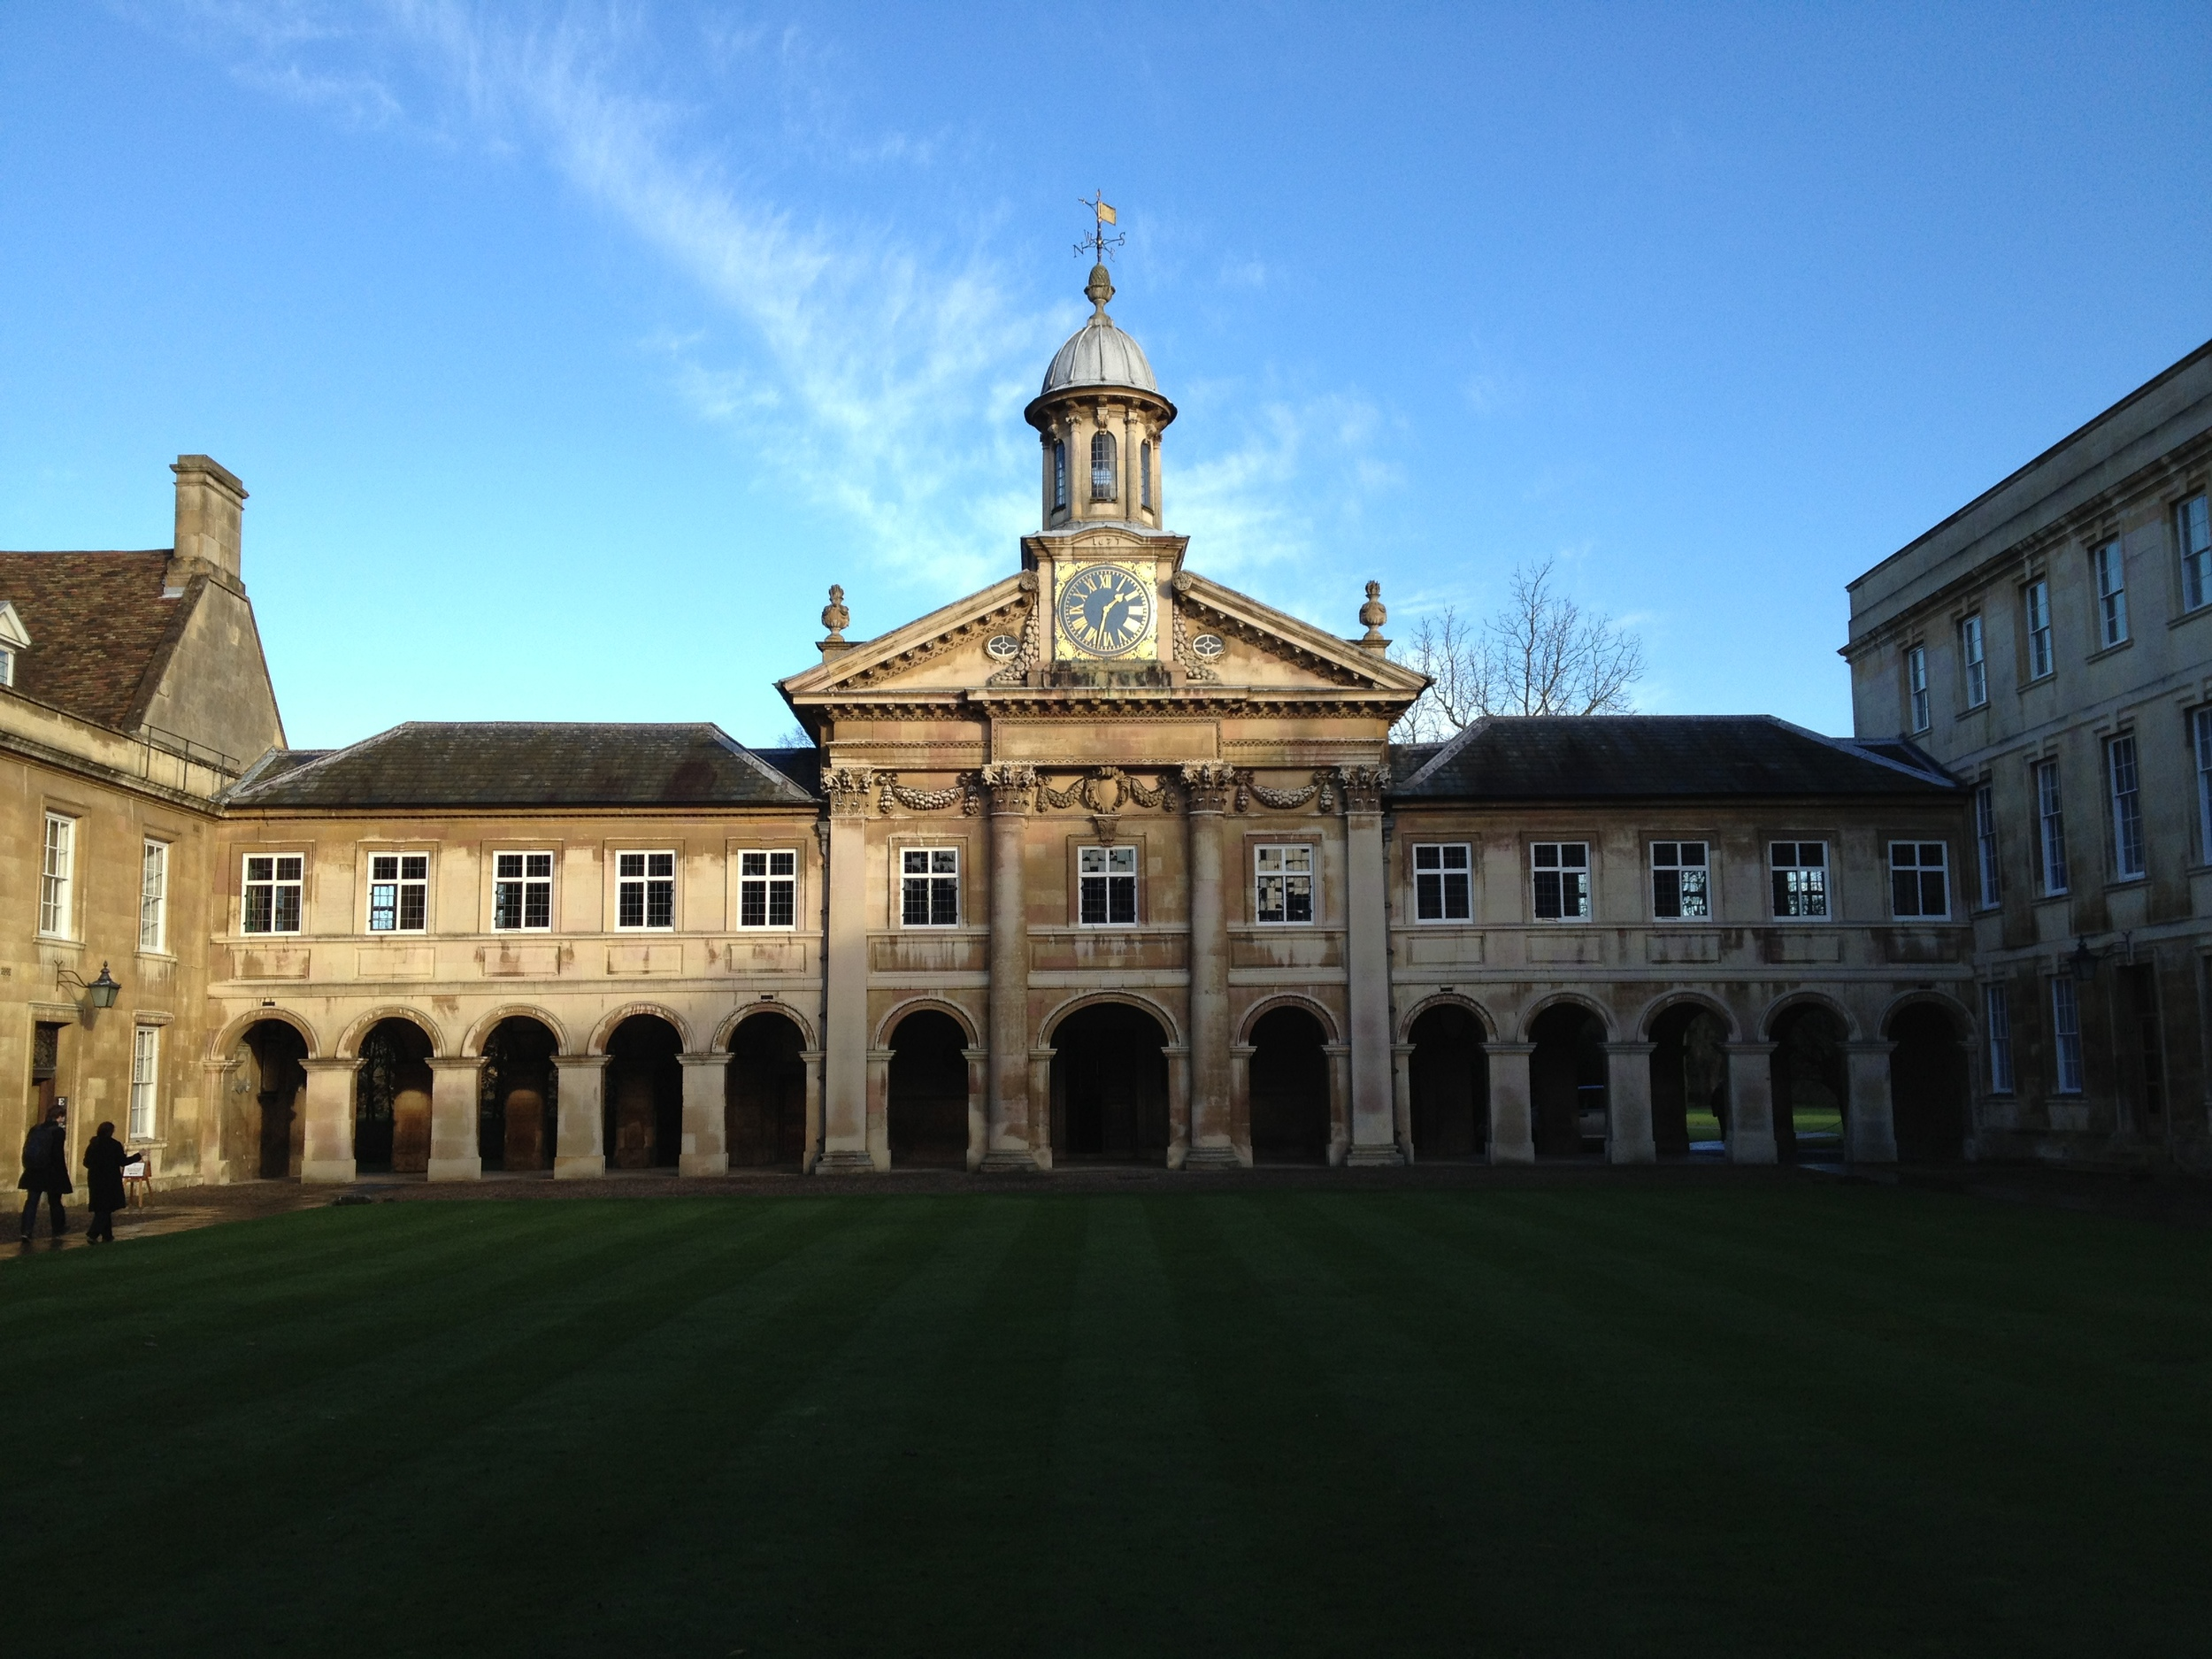 A College at Cambridge